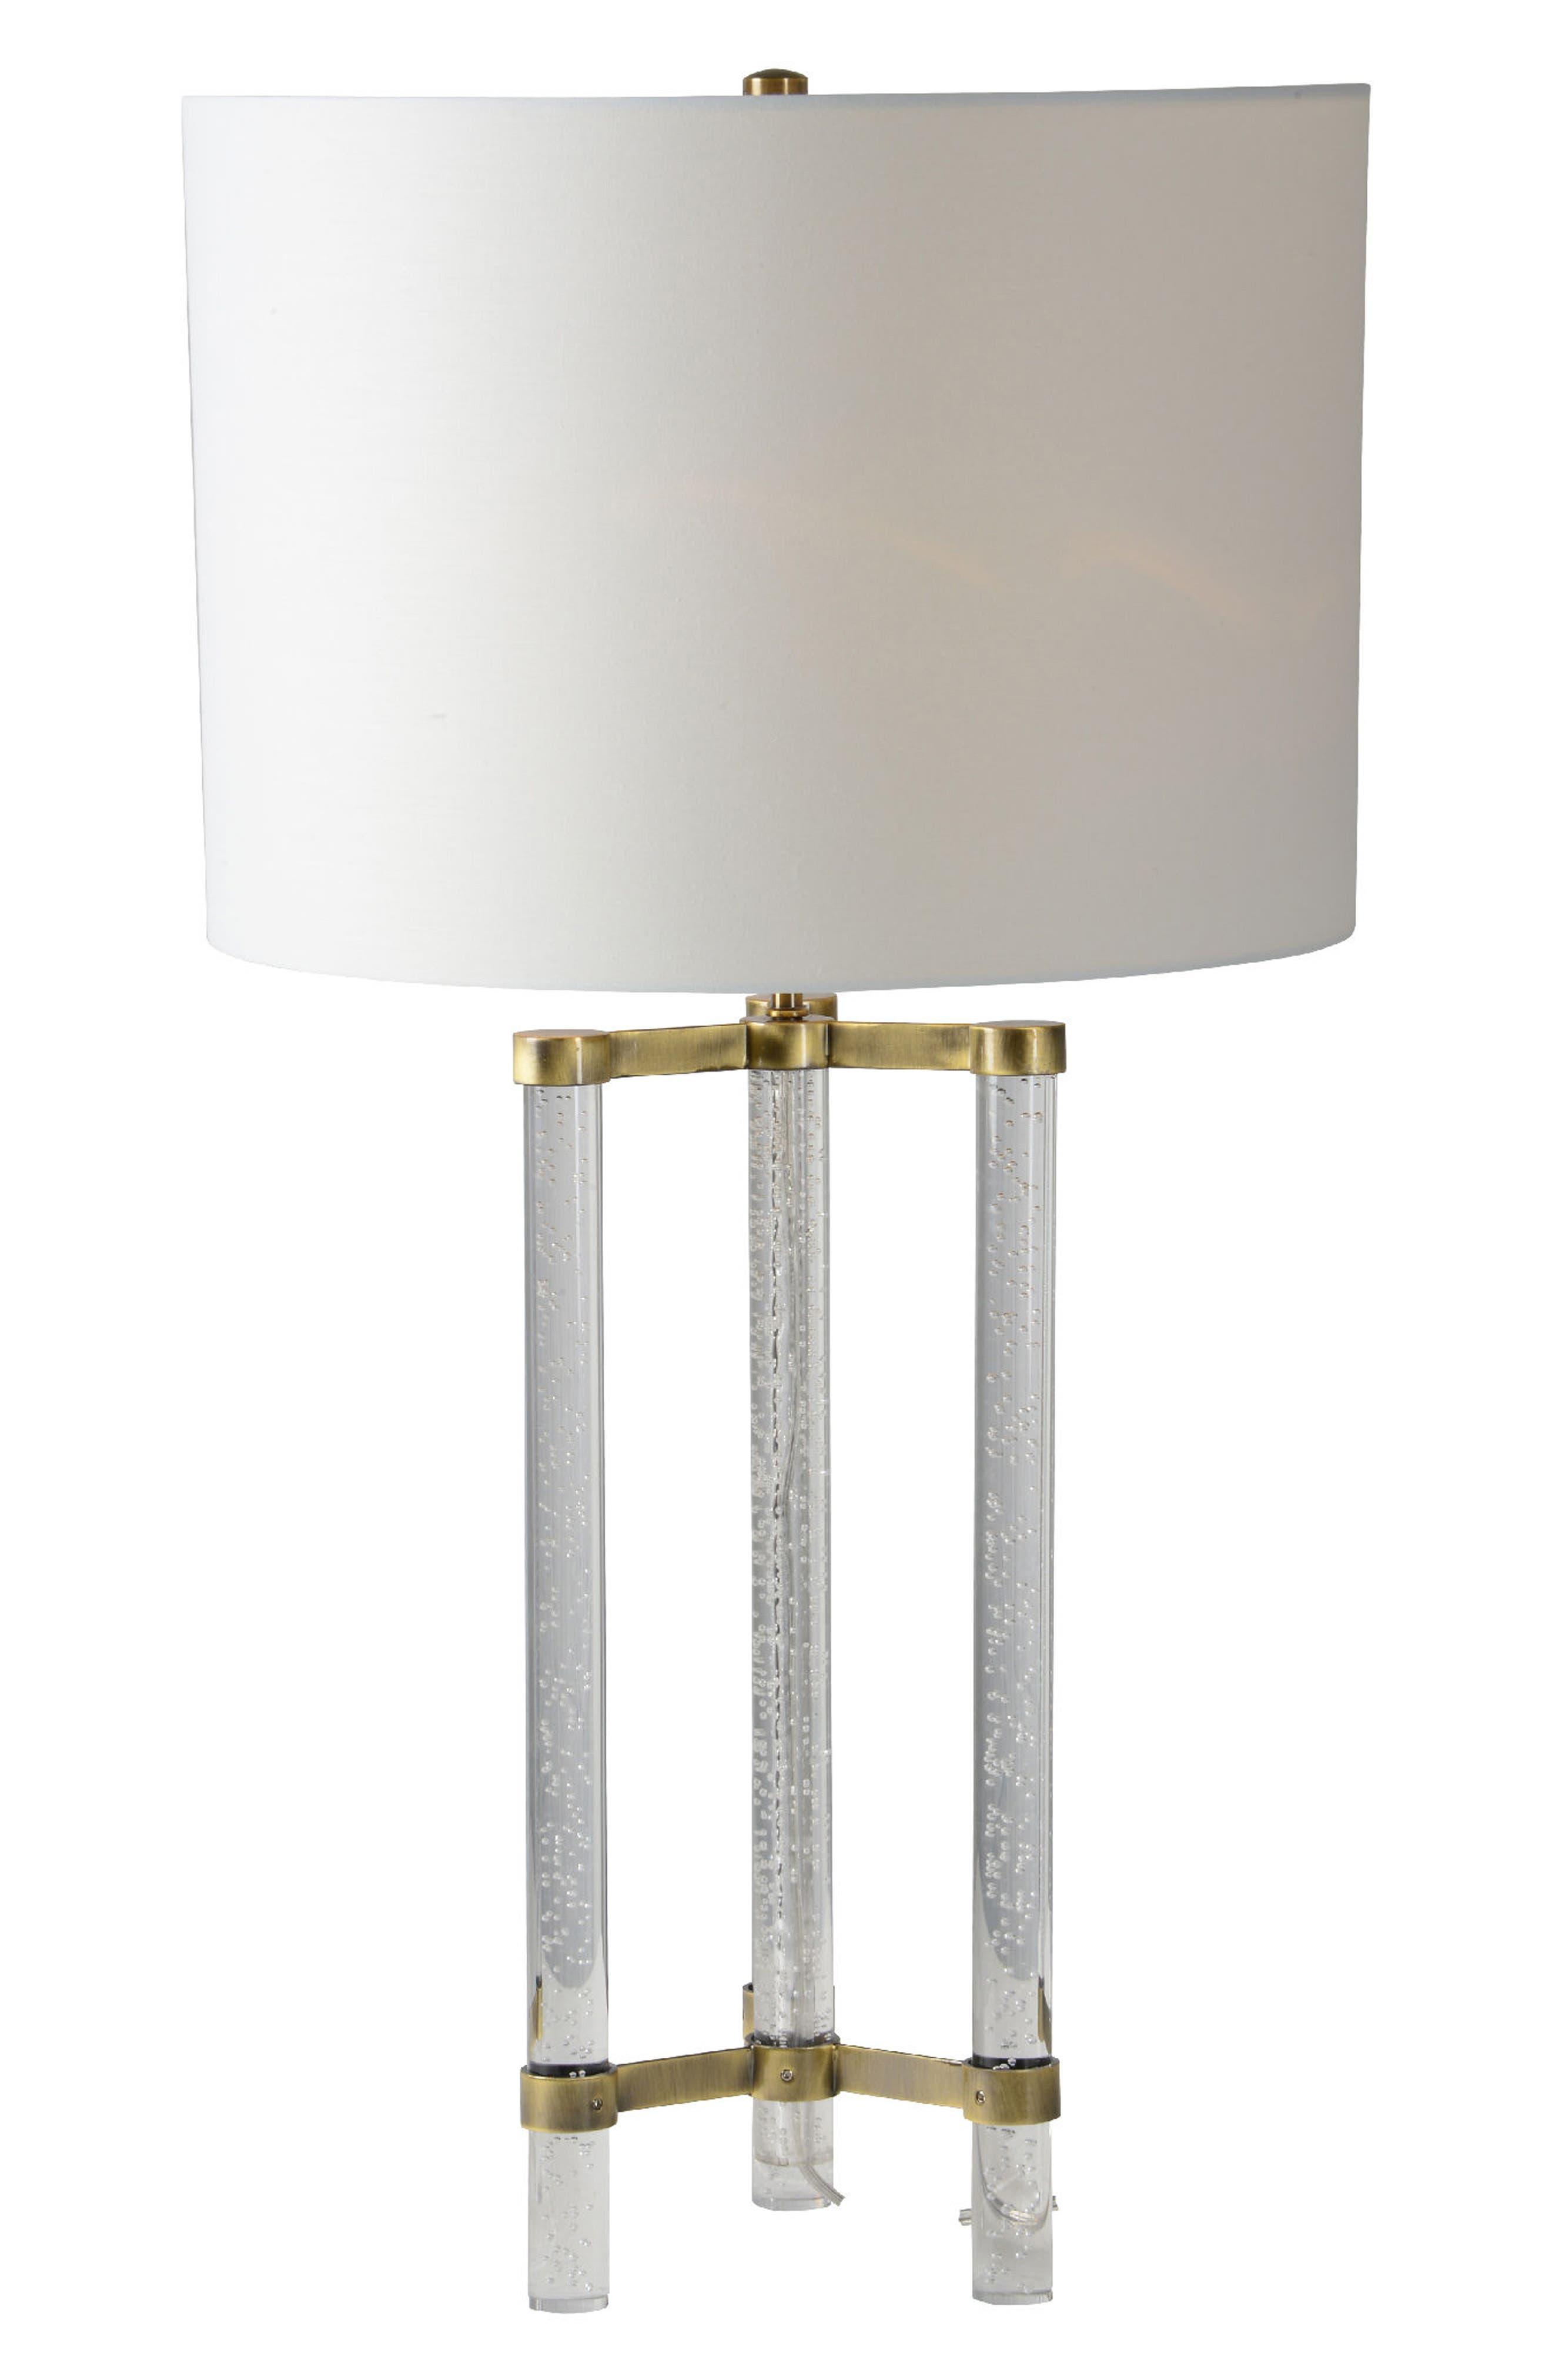 Alternate Image 1 Selected - Renwil Dais Table Lamp